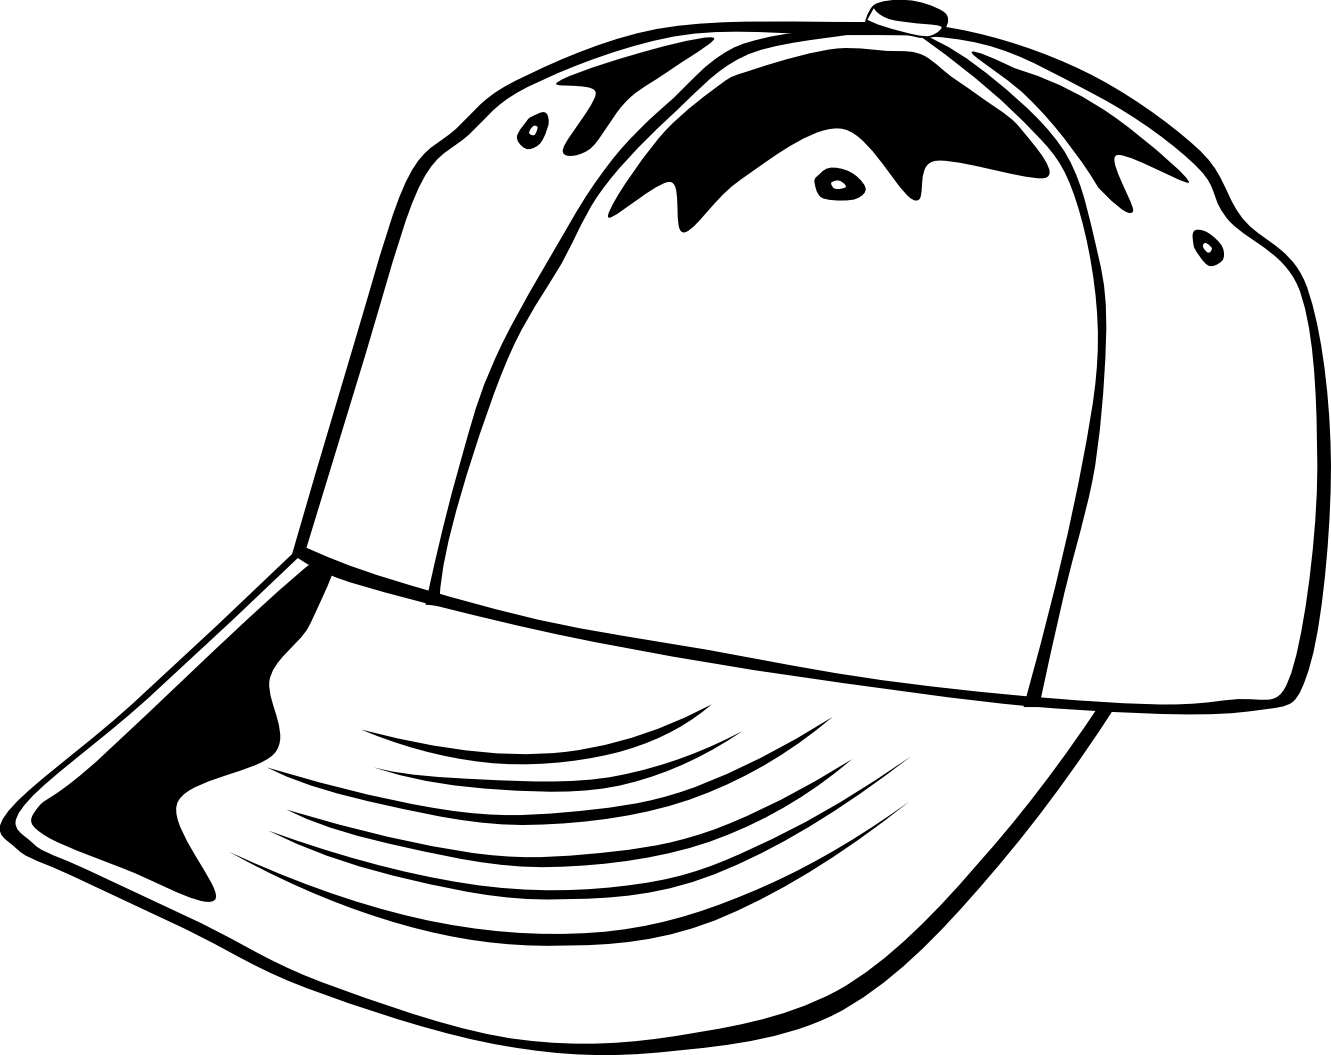 Baseball ball panda free. Diaper clipart black and white